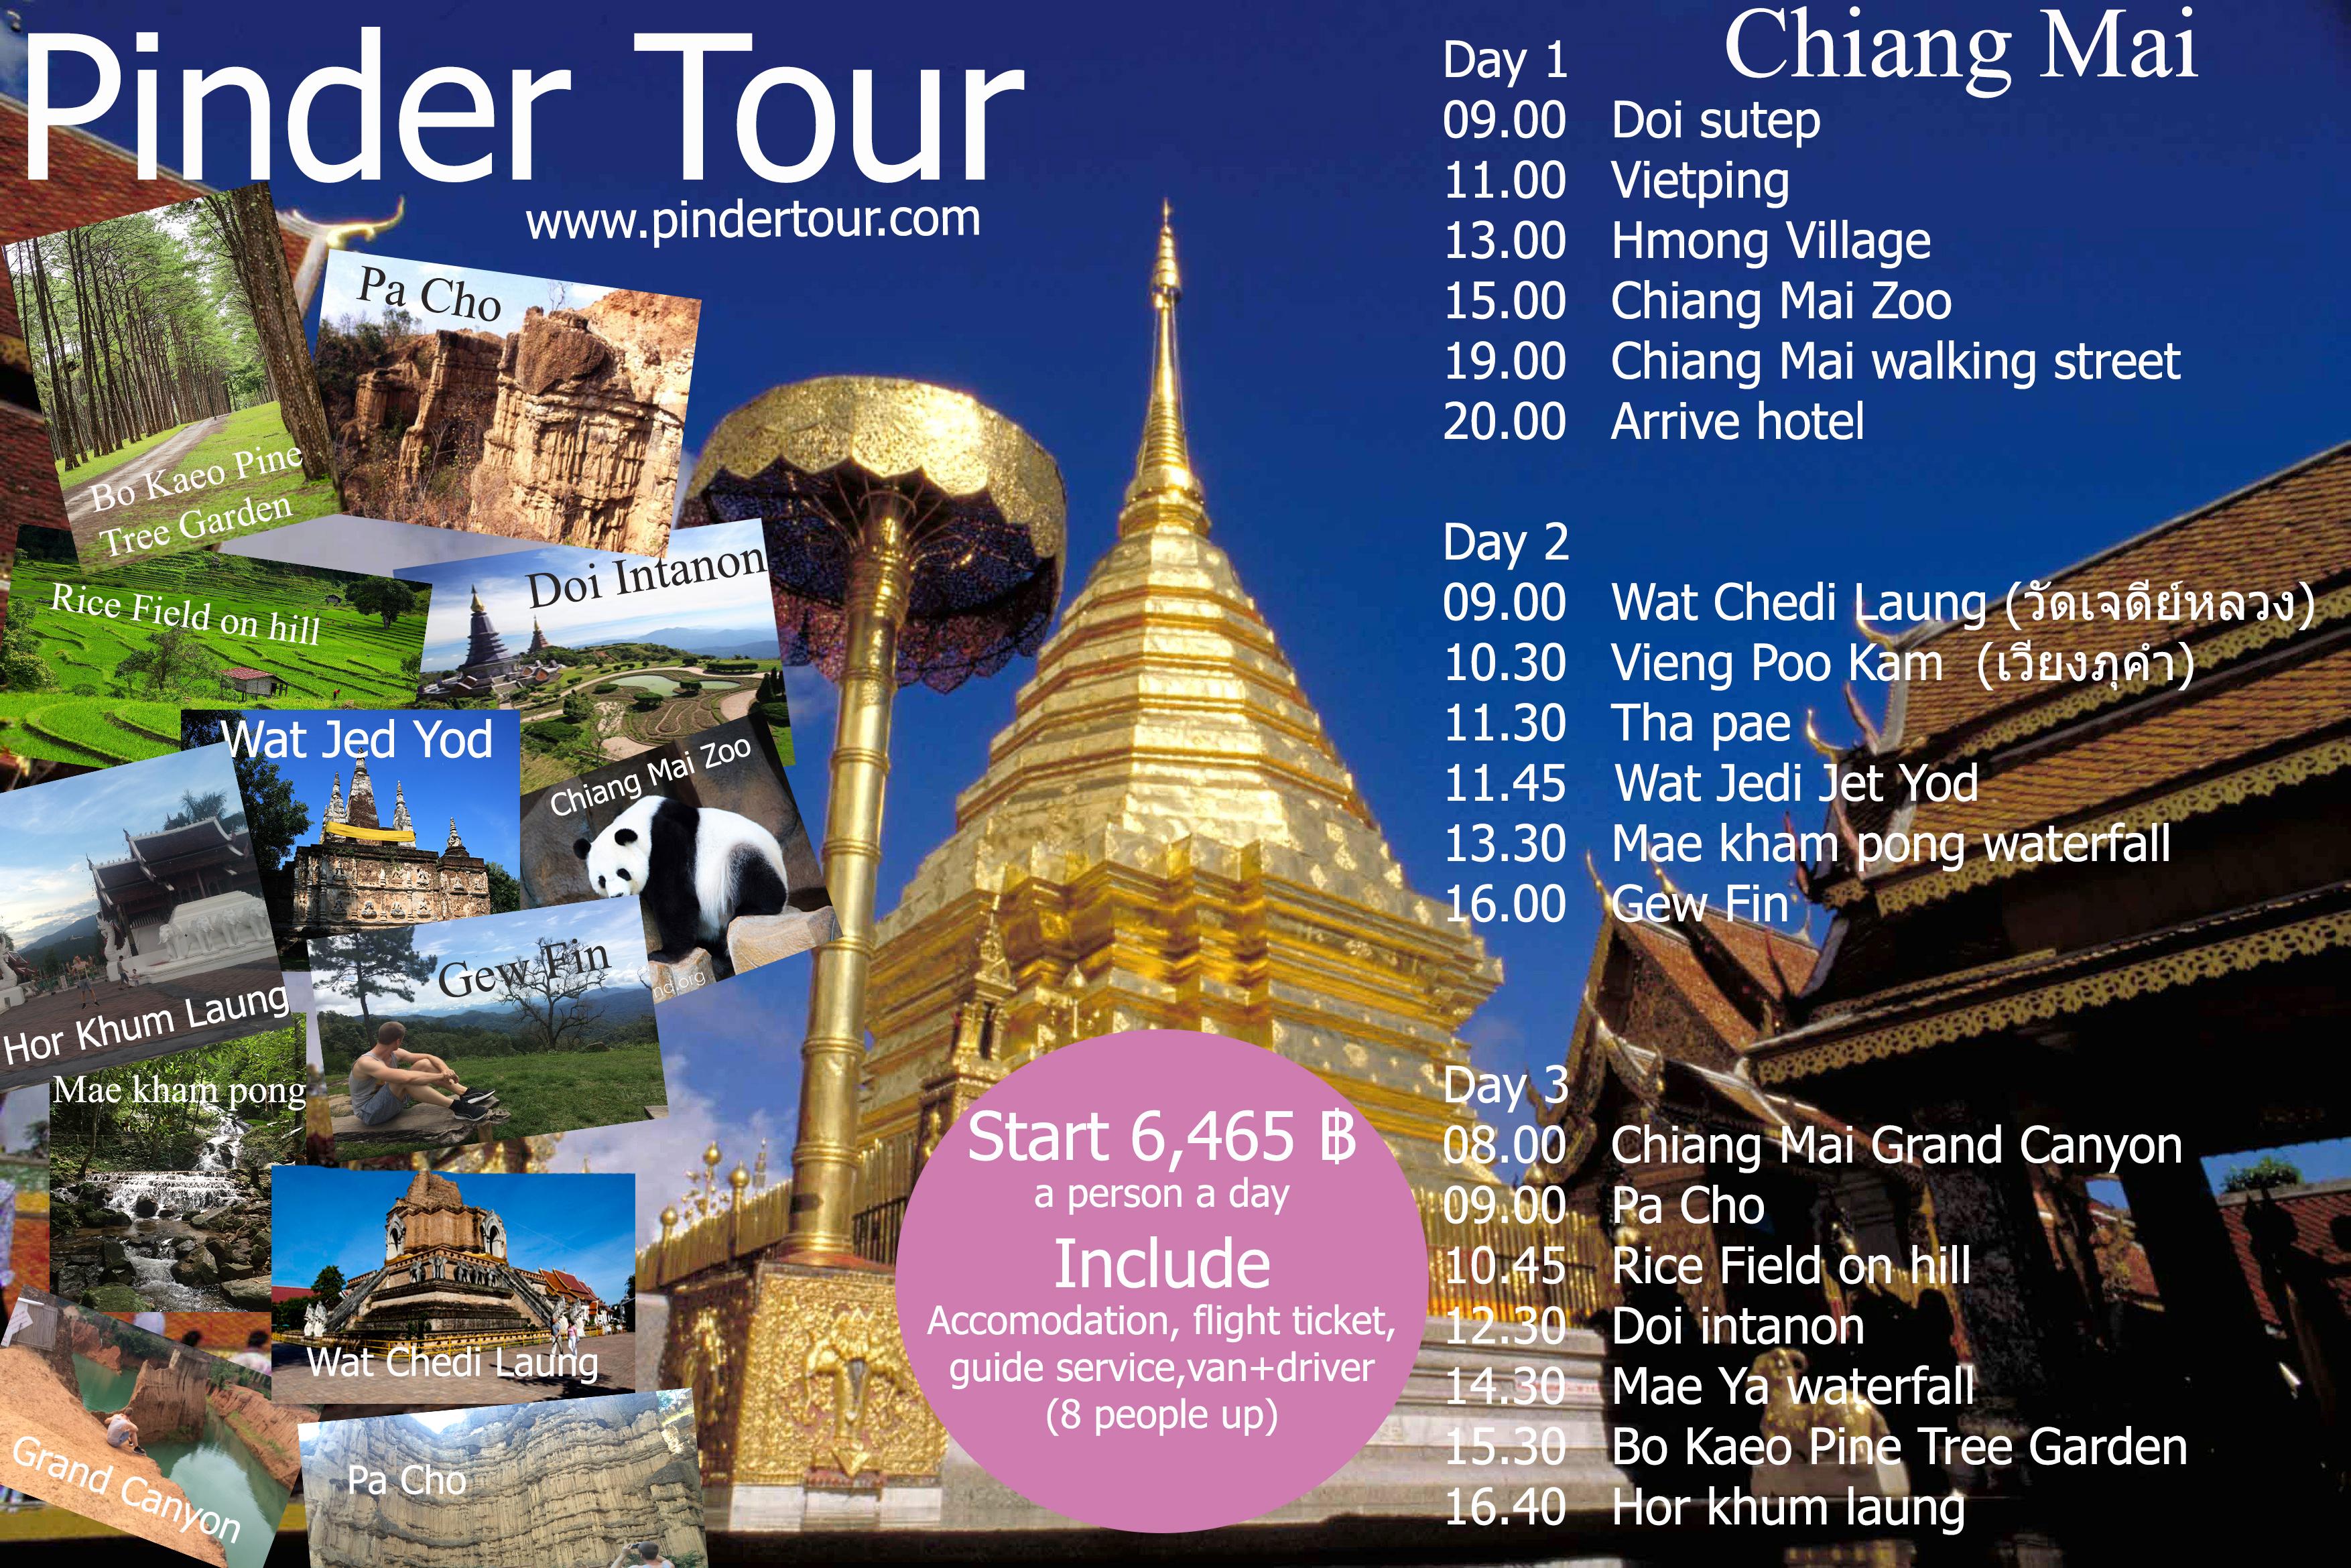 Chiang Mai (P014)